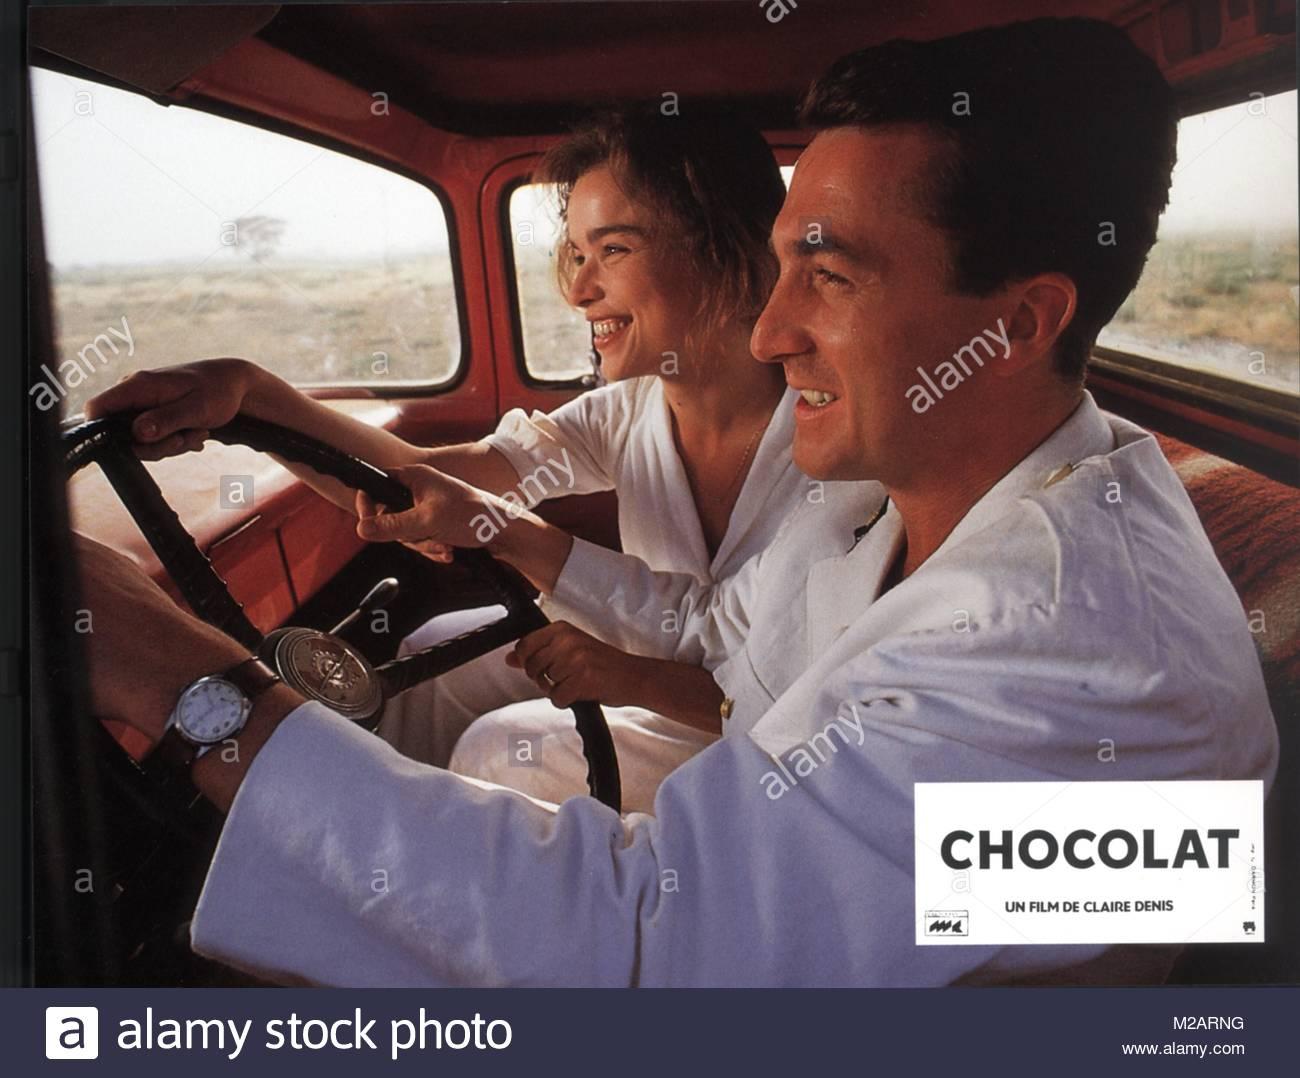 Chocolat - Stock Image